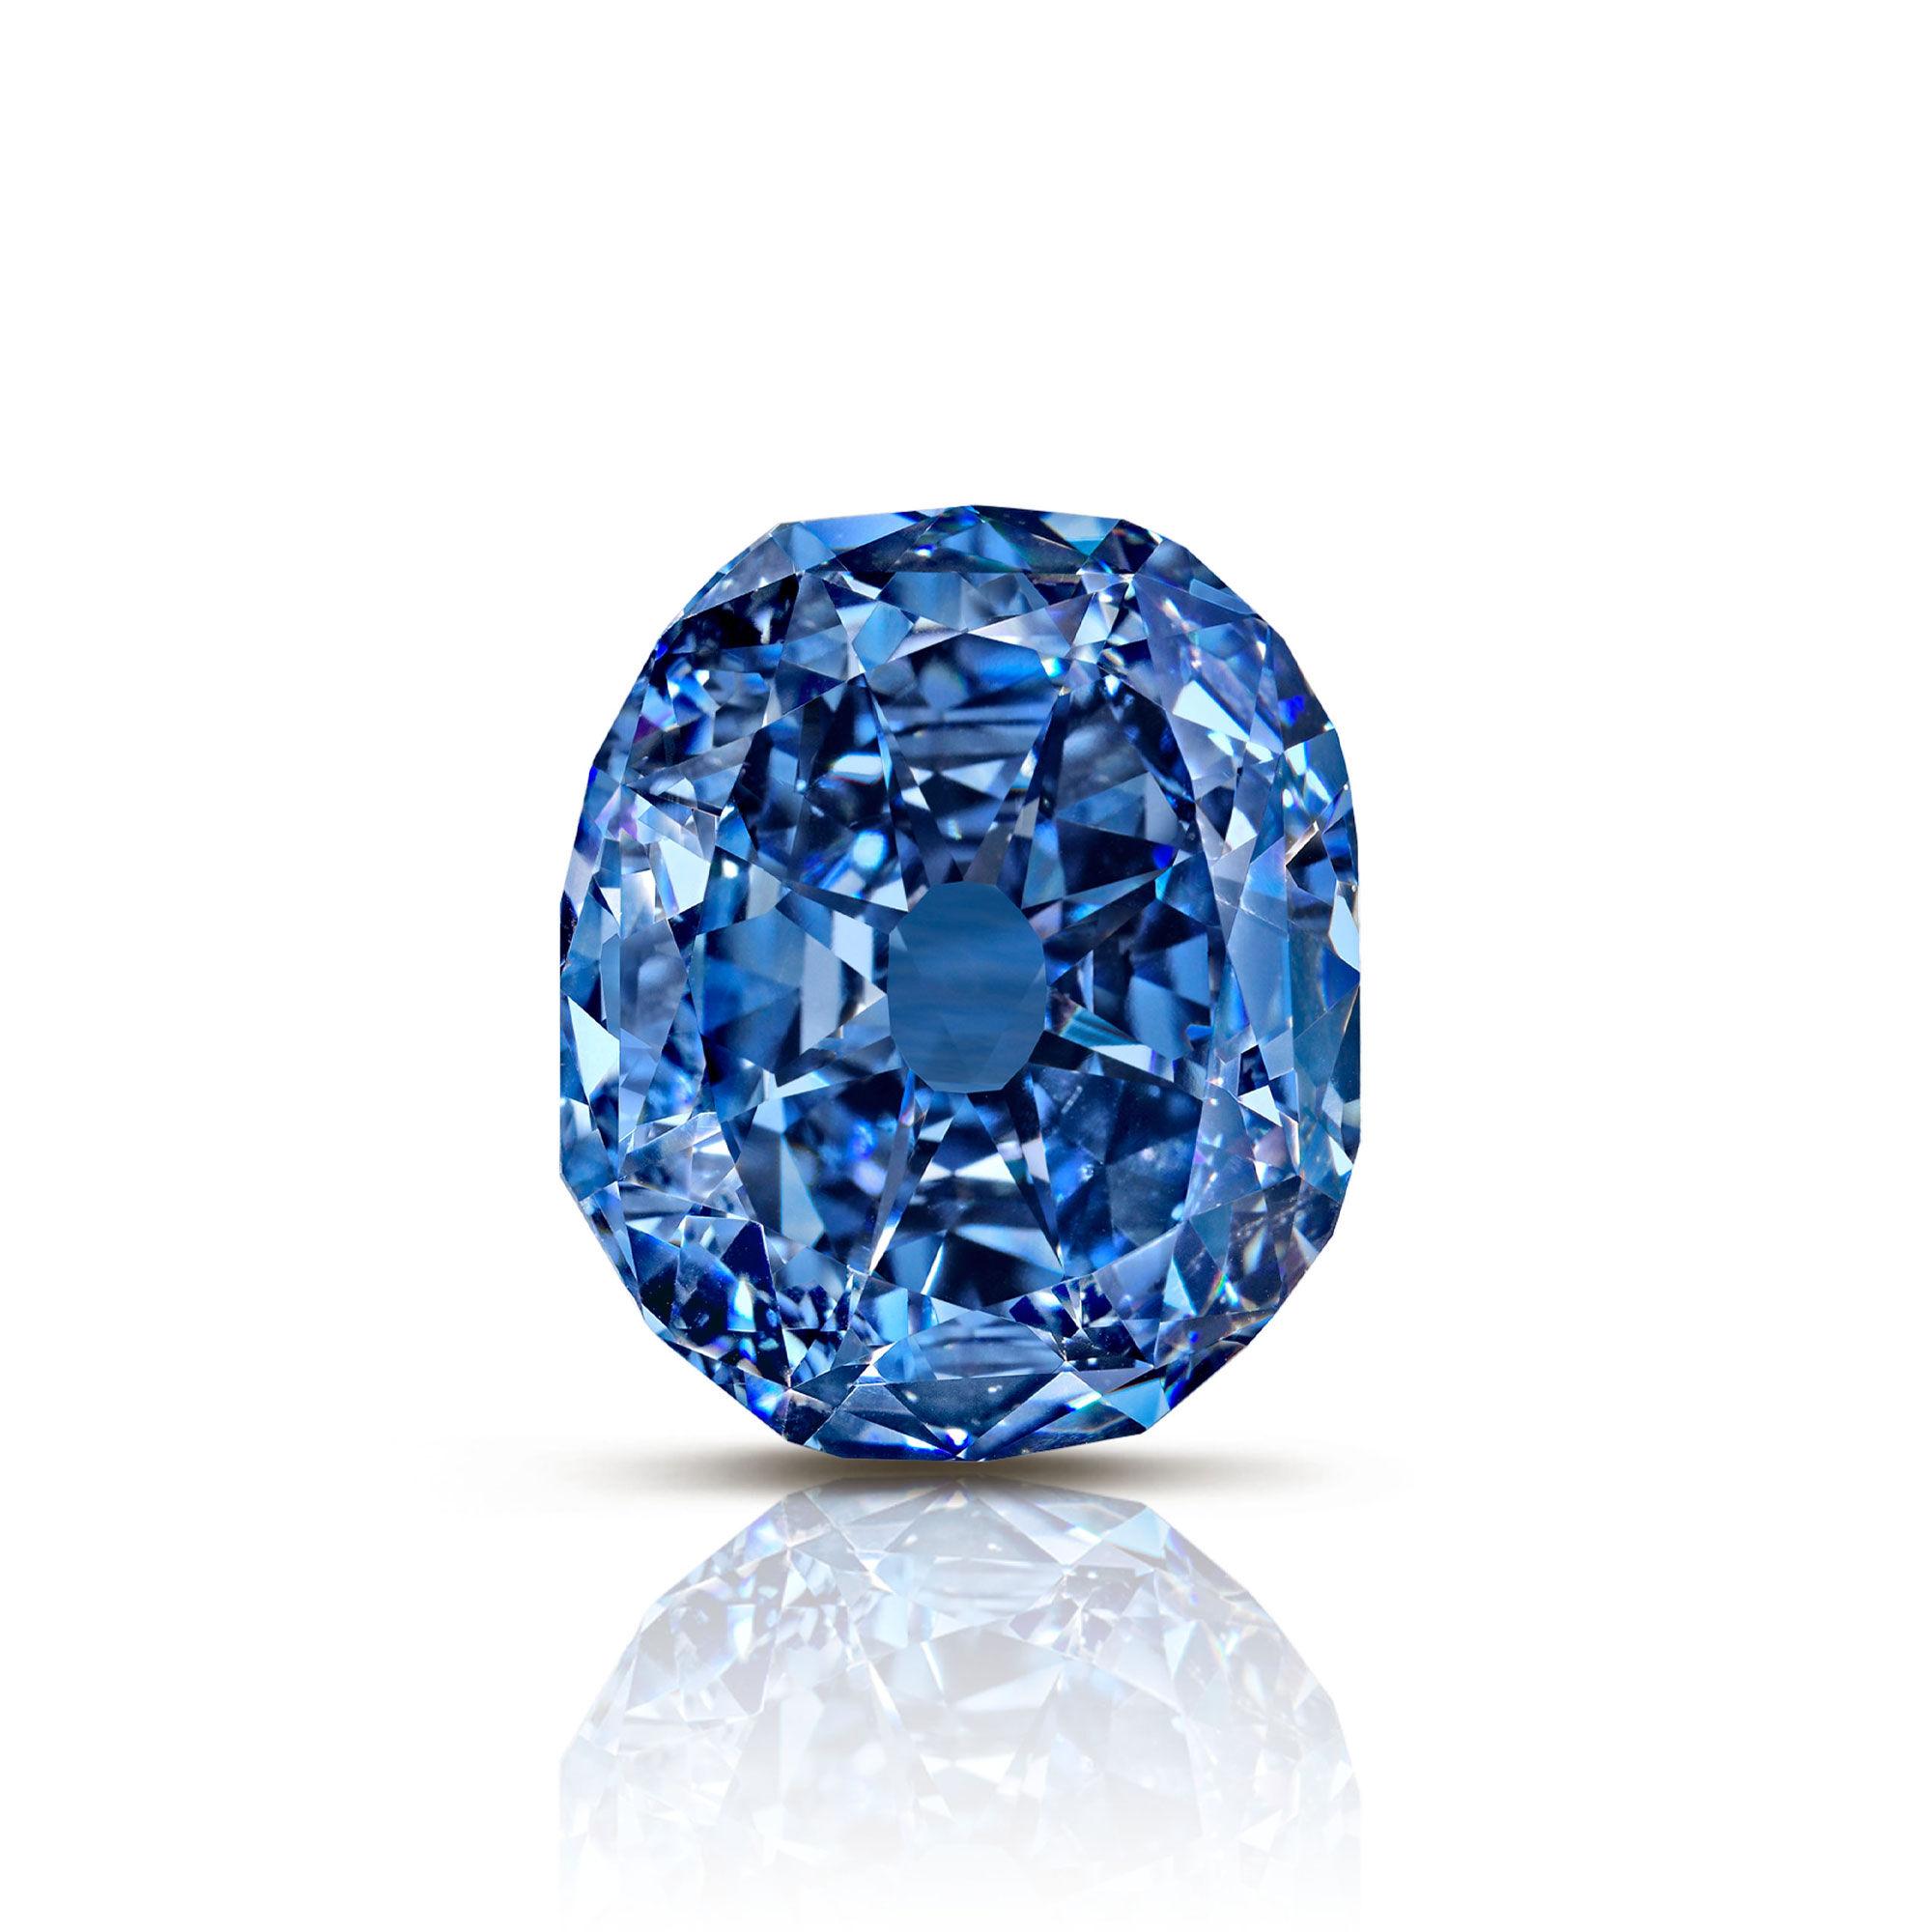 The Wittlesbach-Graff blue diamond